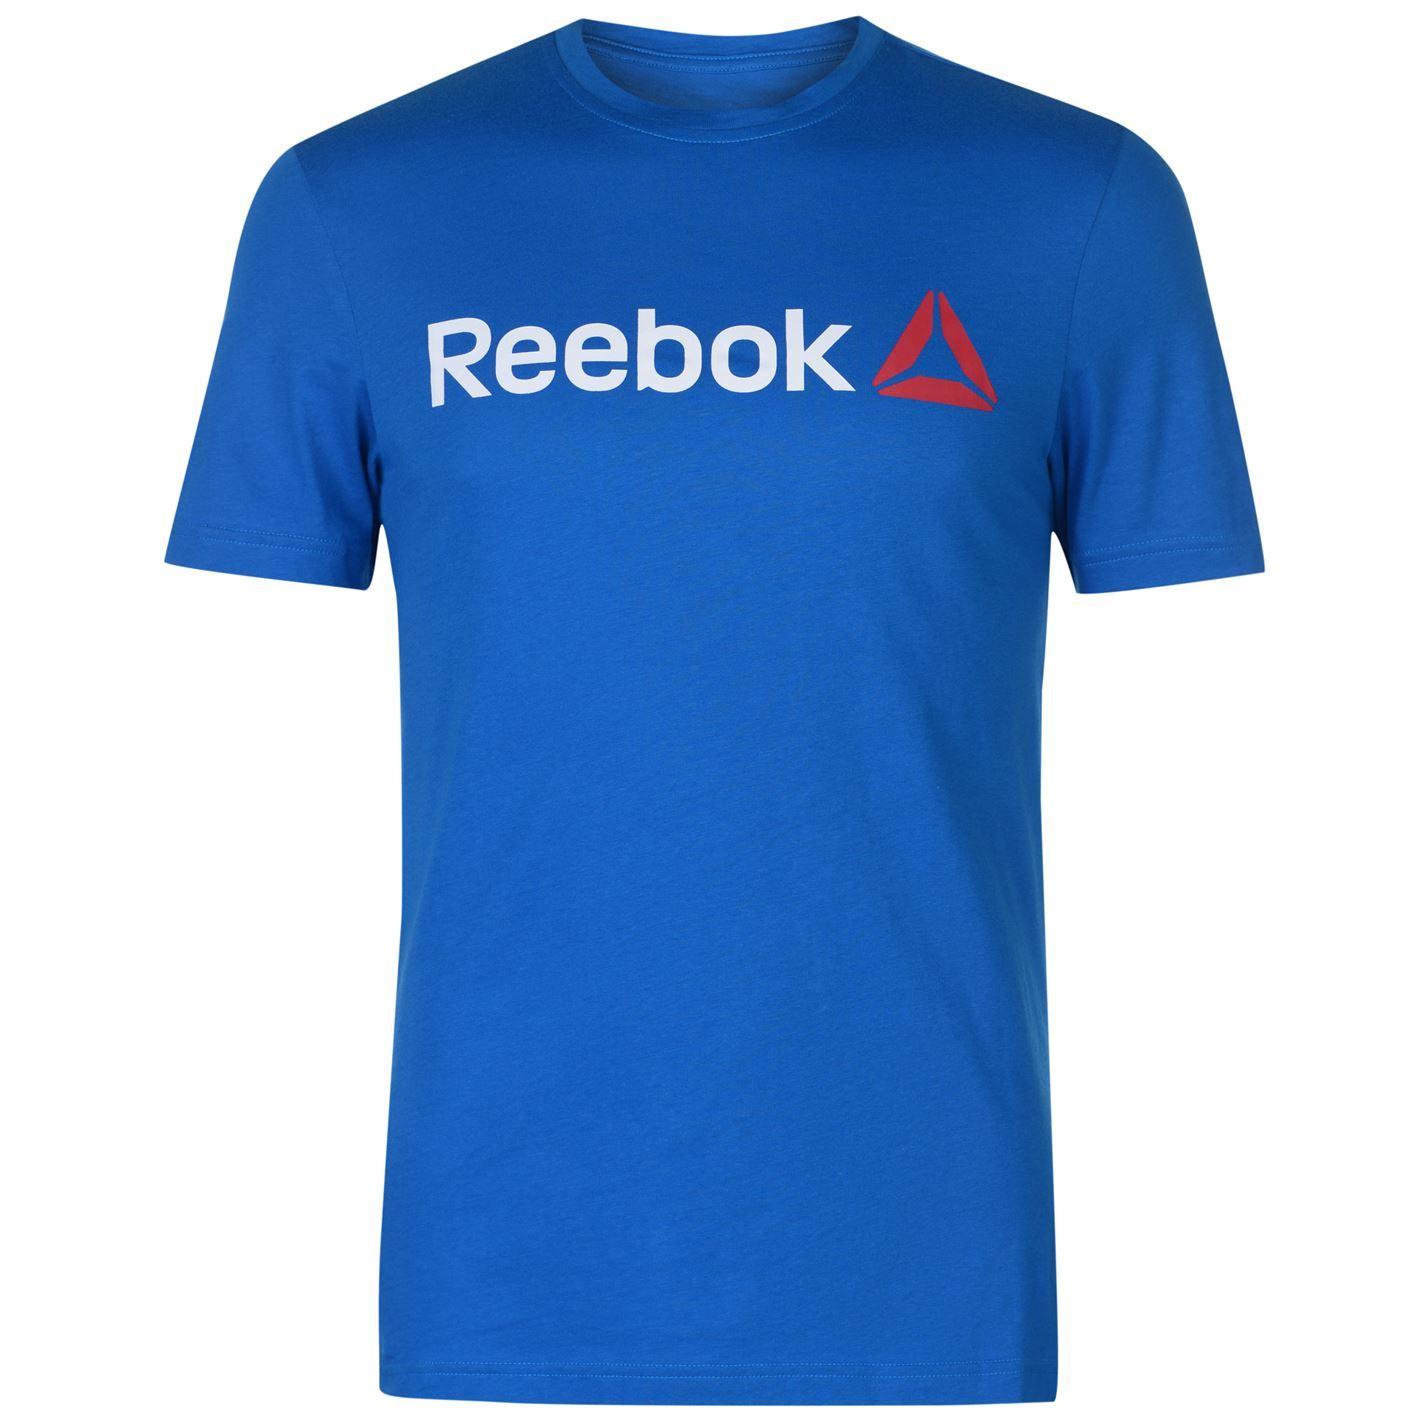 Reebok-Delta-Logo-T-Shirt-Mens-Tee-Shirt-Top thumbnail 9